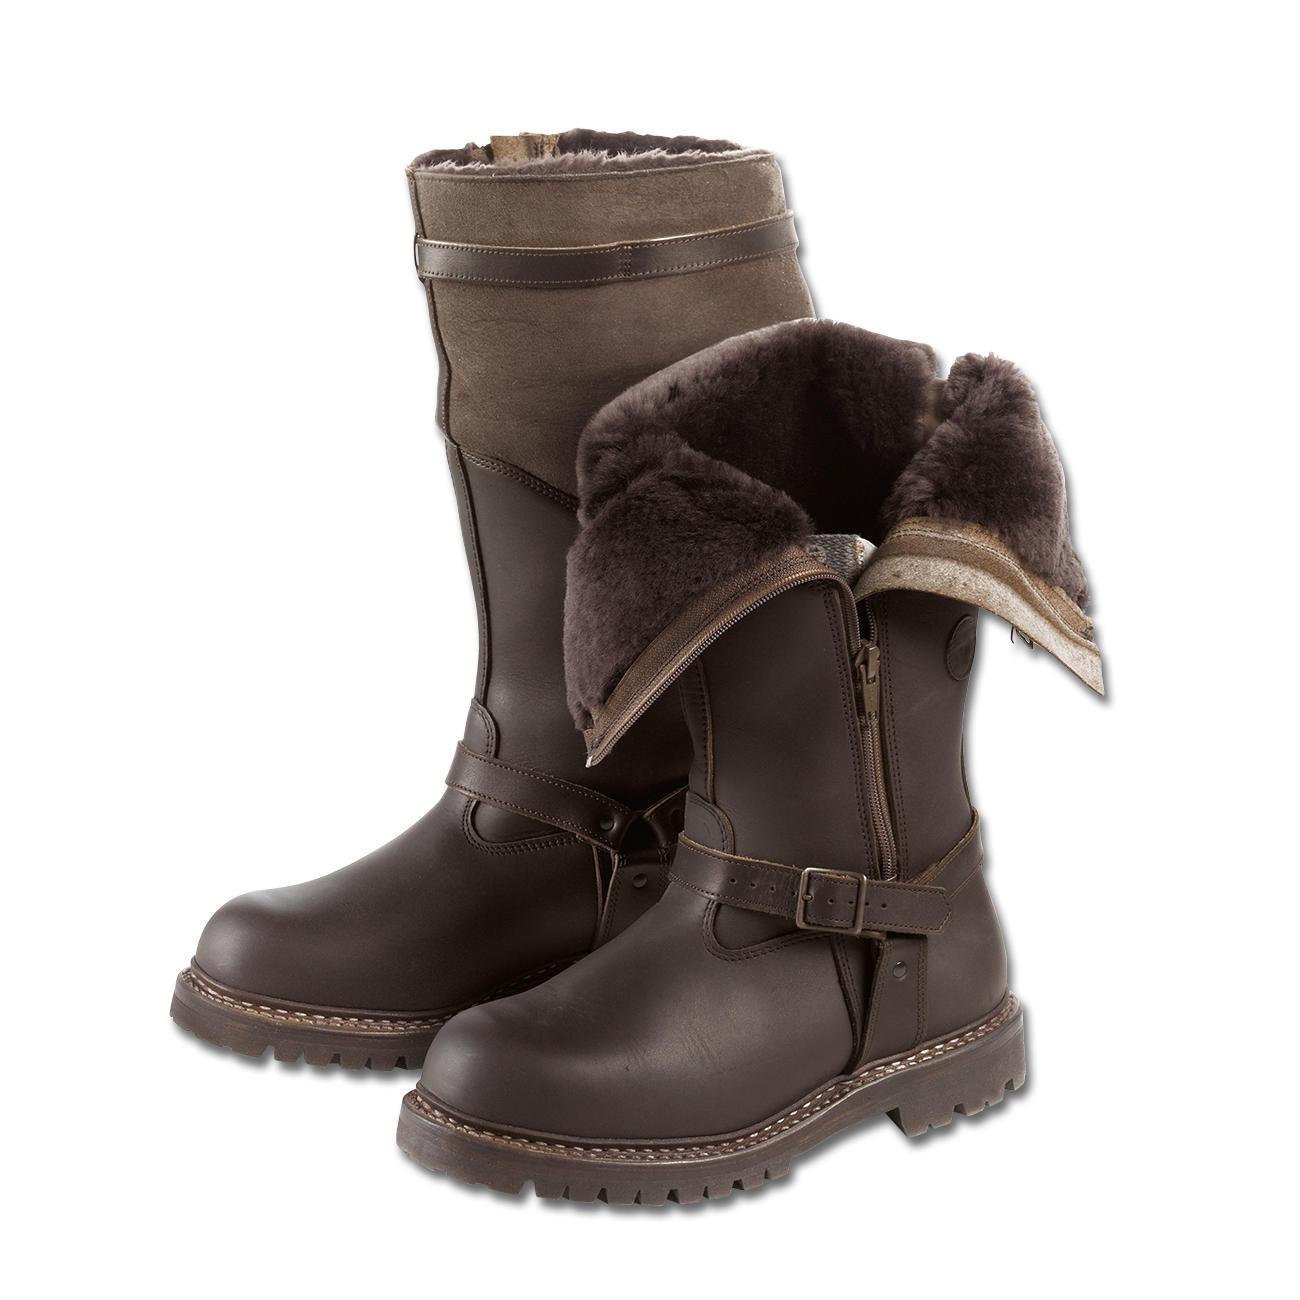 Buy Pilot Shearling Boot